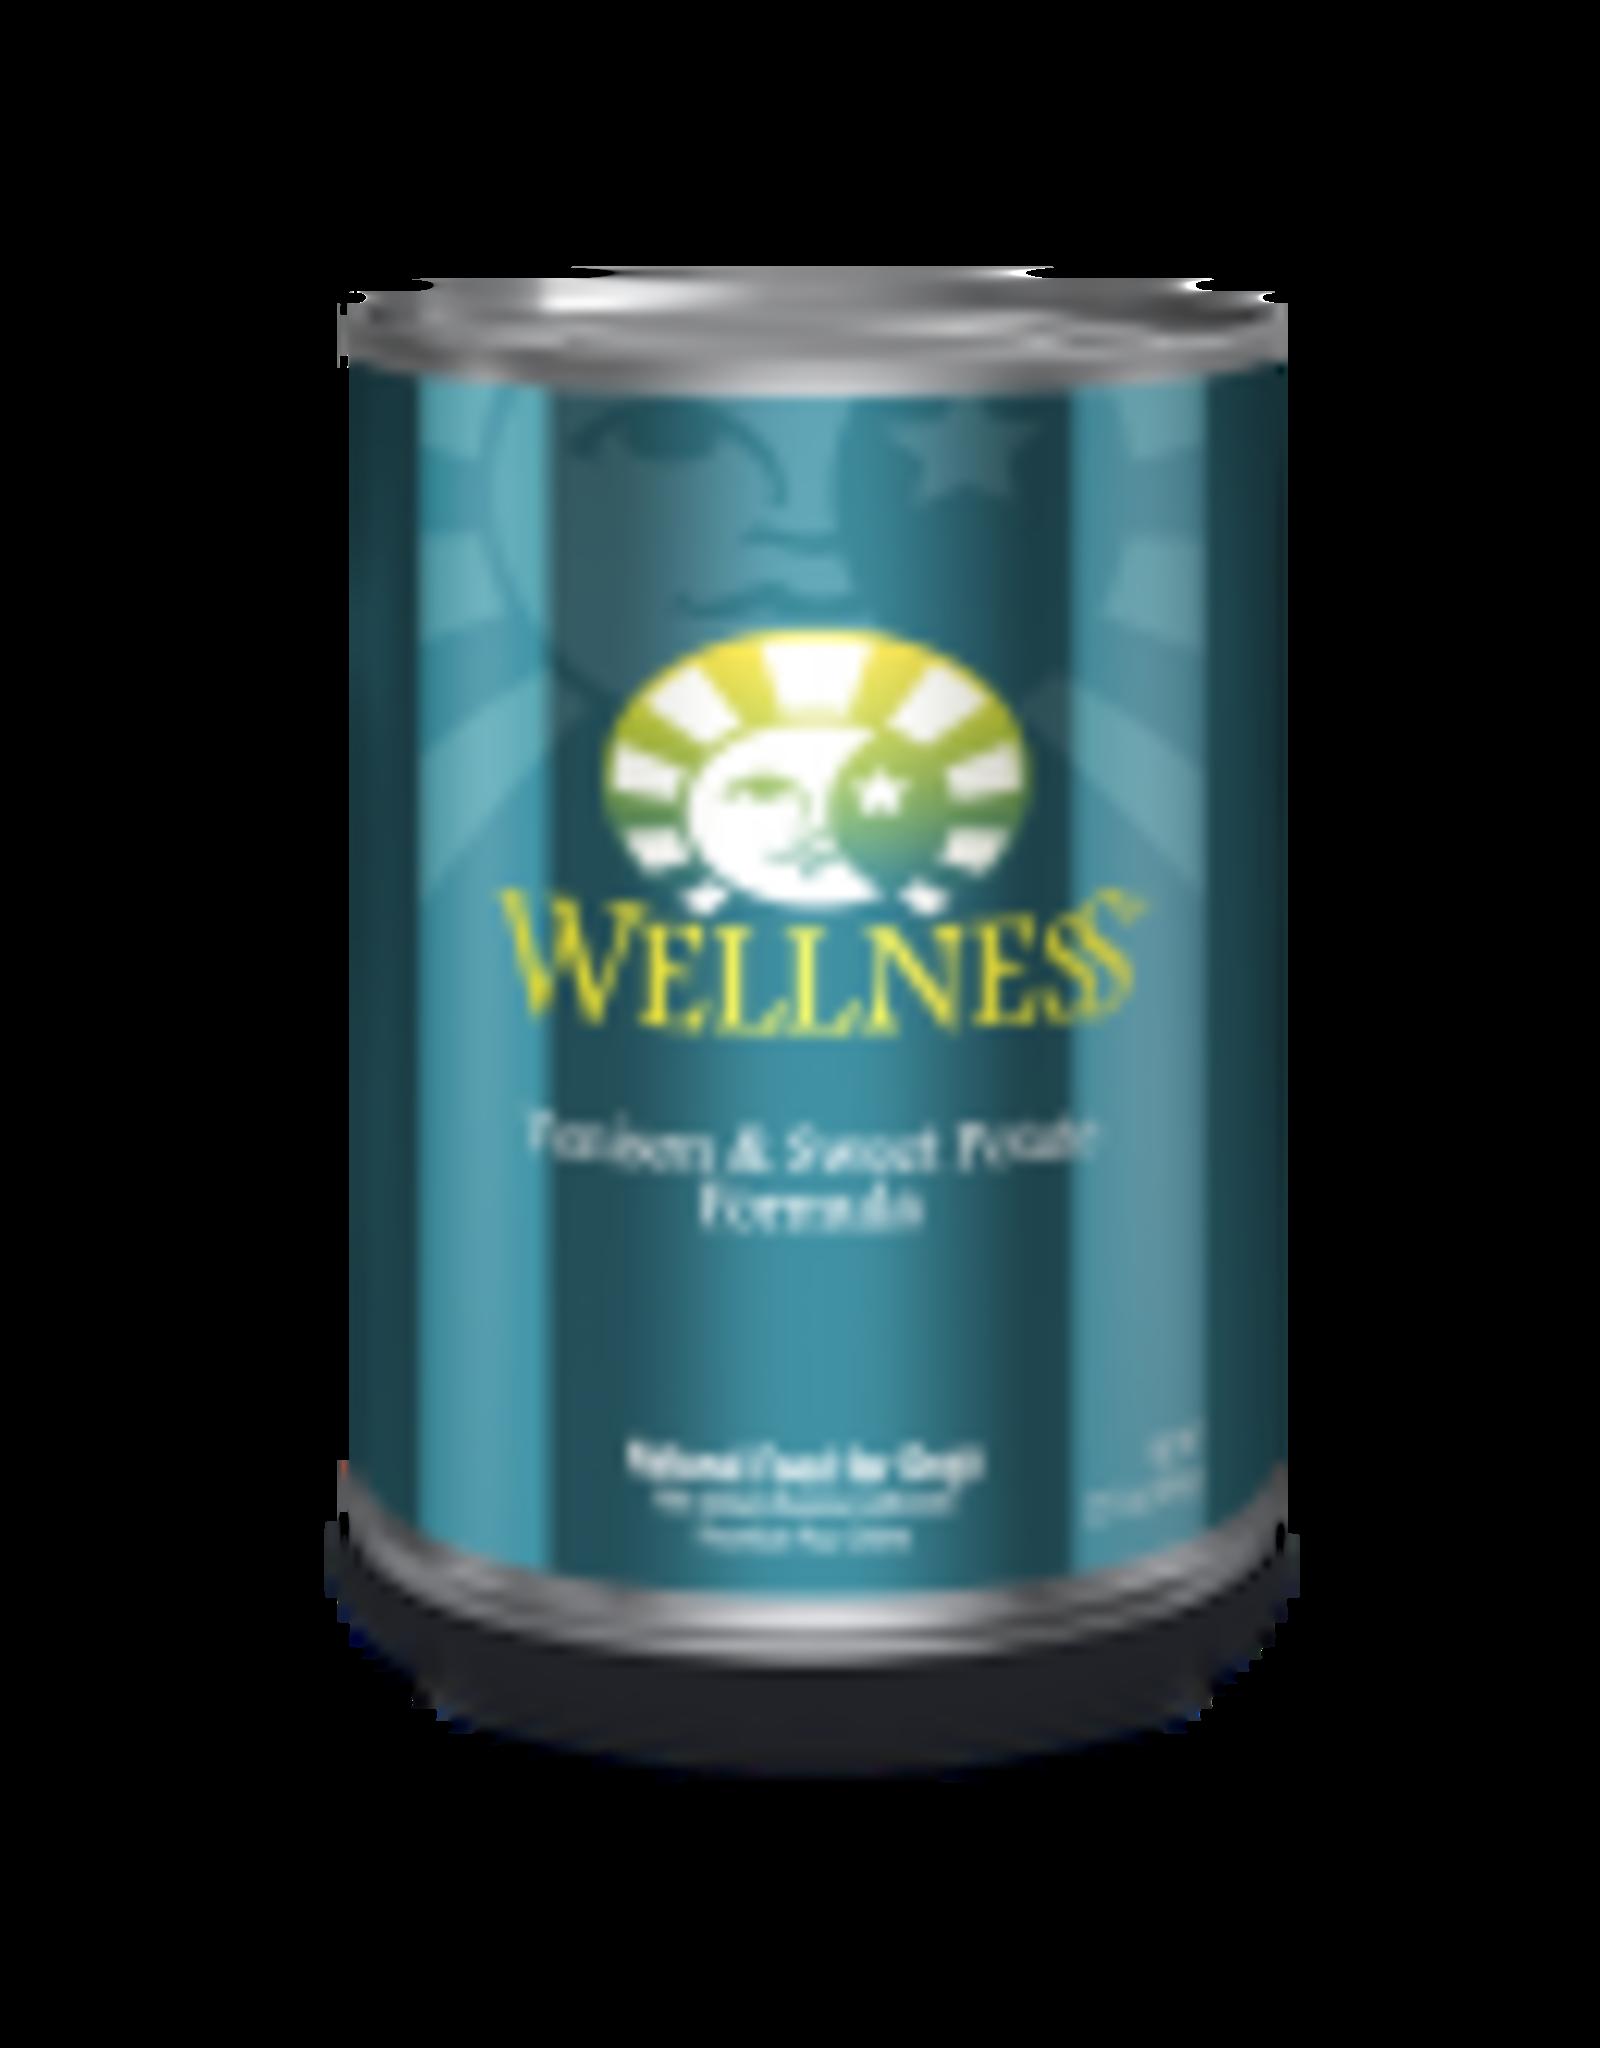 Wellness Wellness Canine Venison 12.5oz